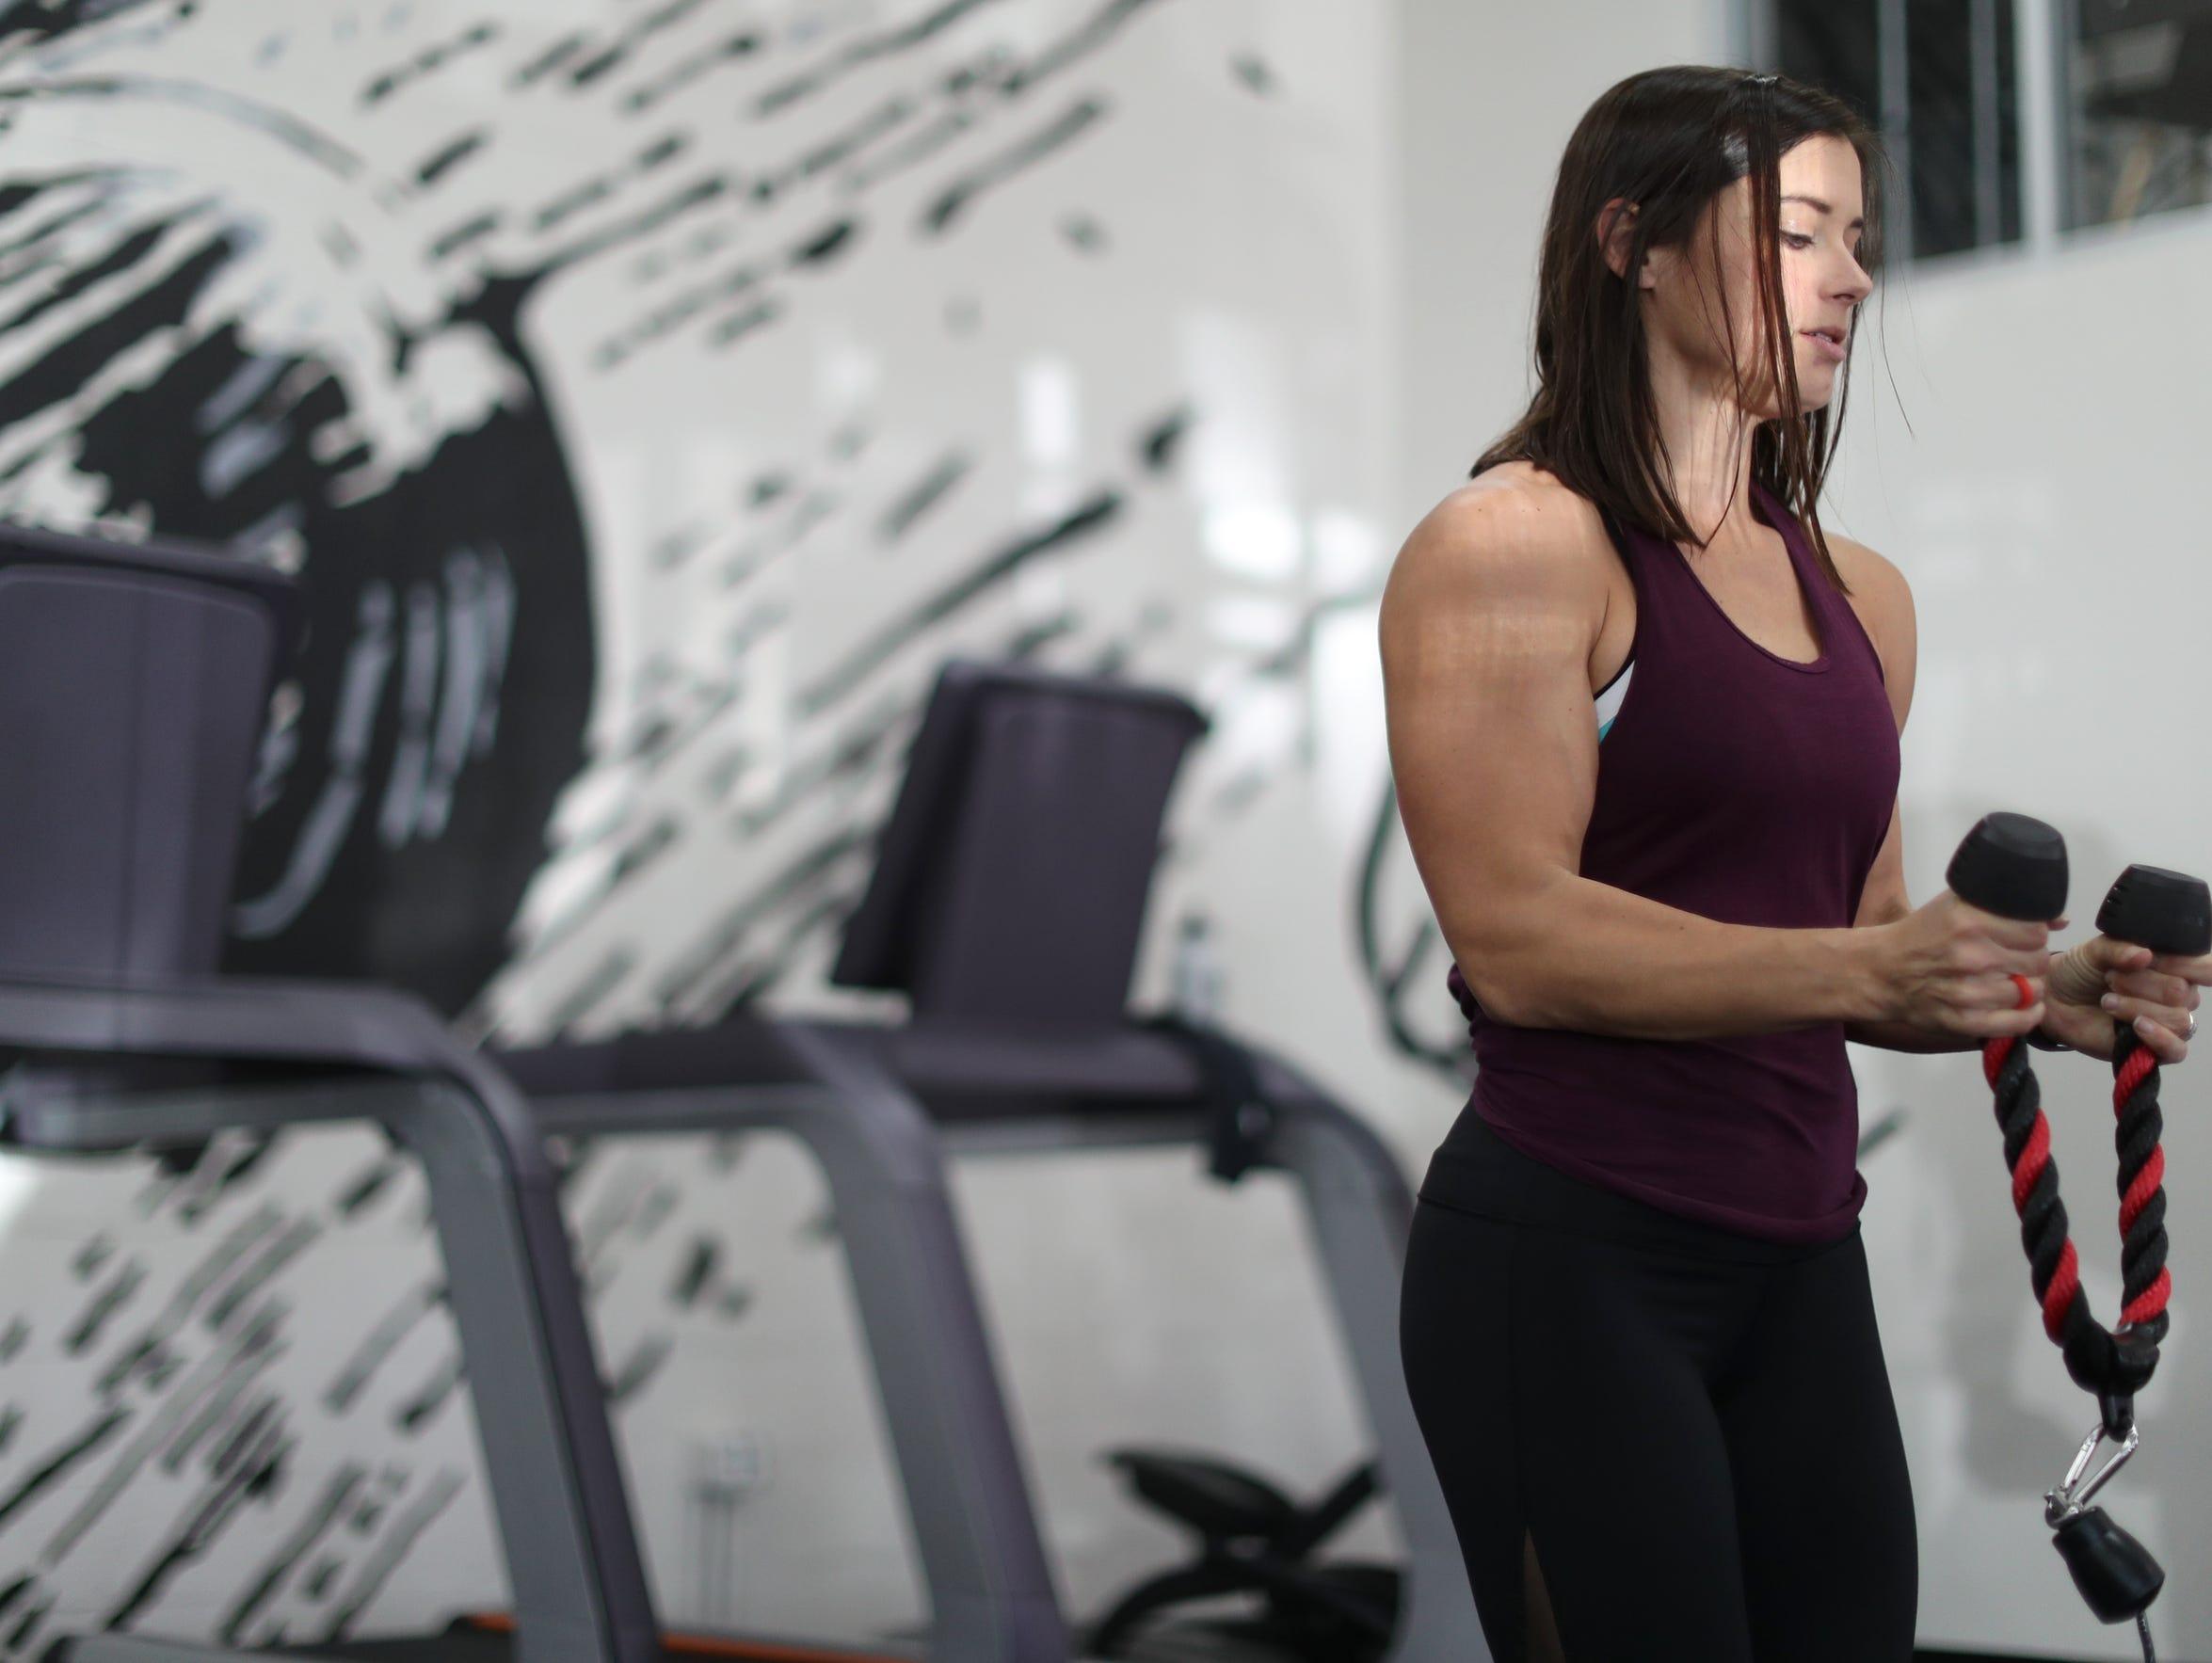 Jennifer Powell, who owns the franchise fitness center